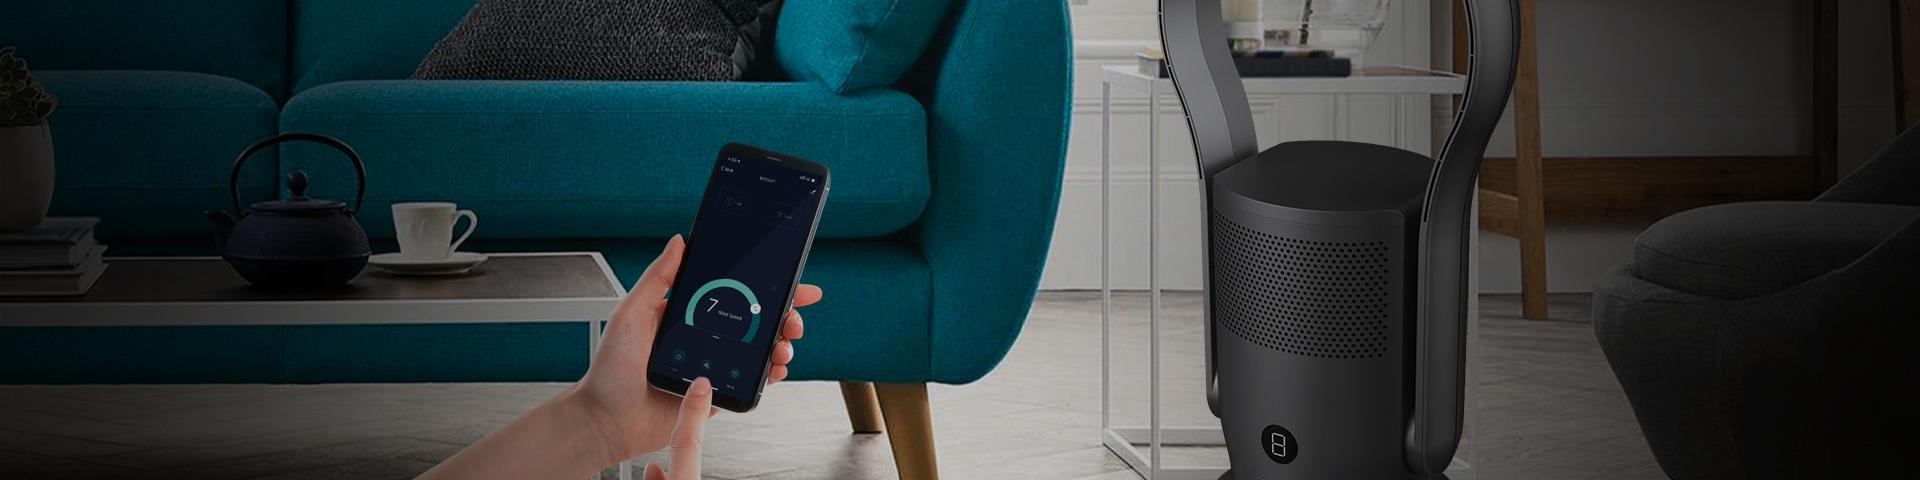 Bladeless Purifier with Wi-Fi Control